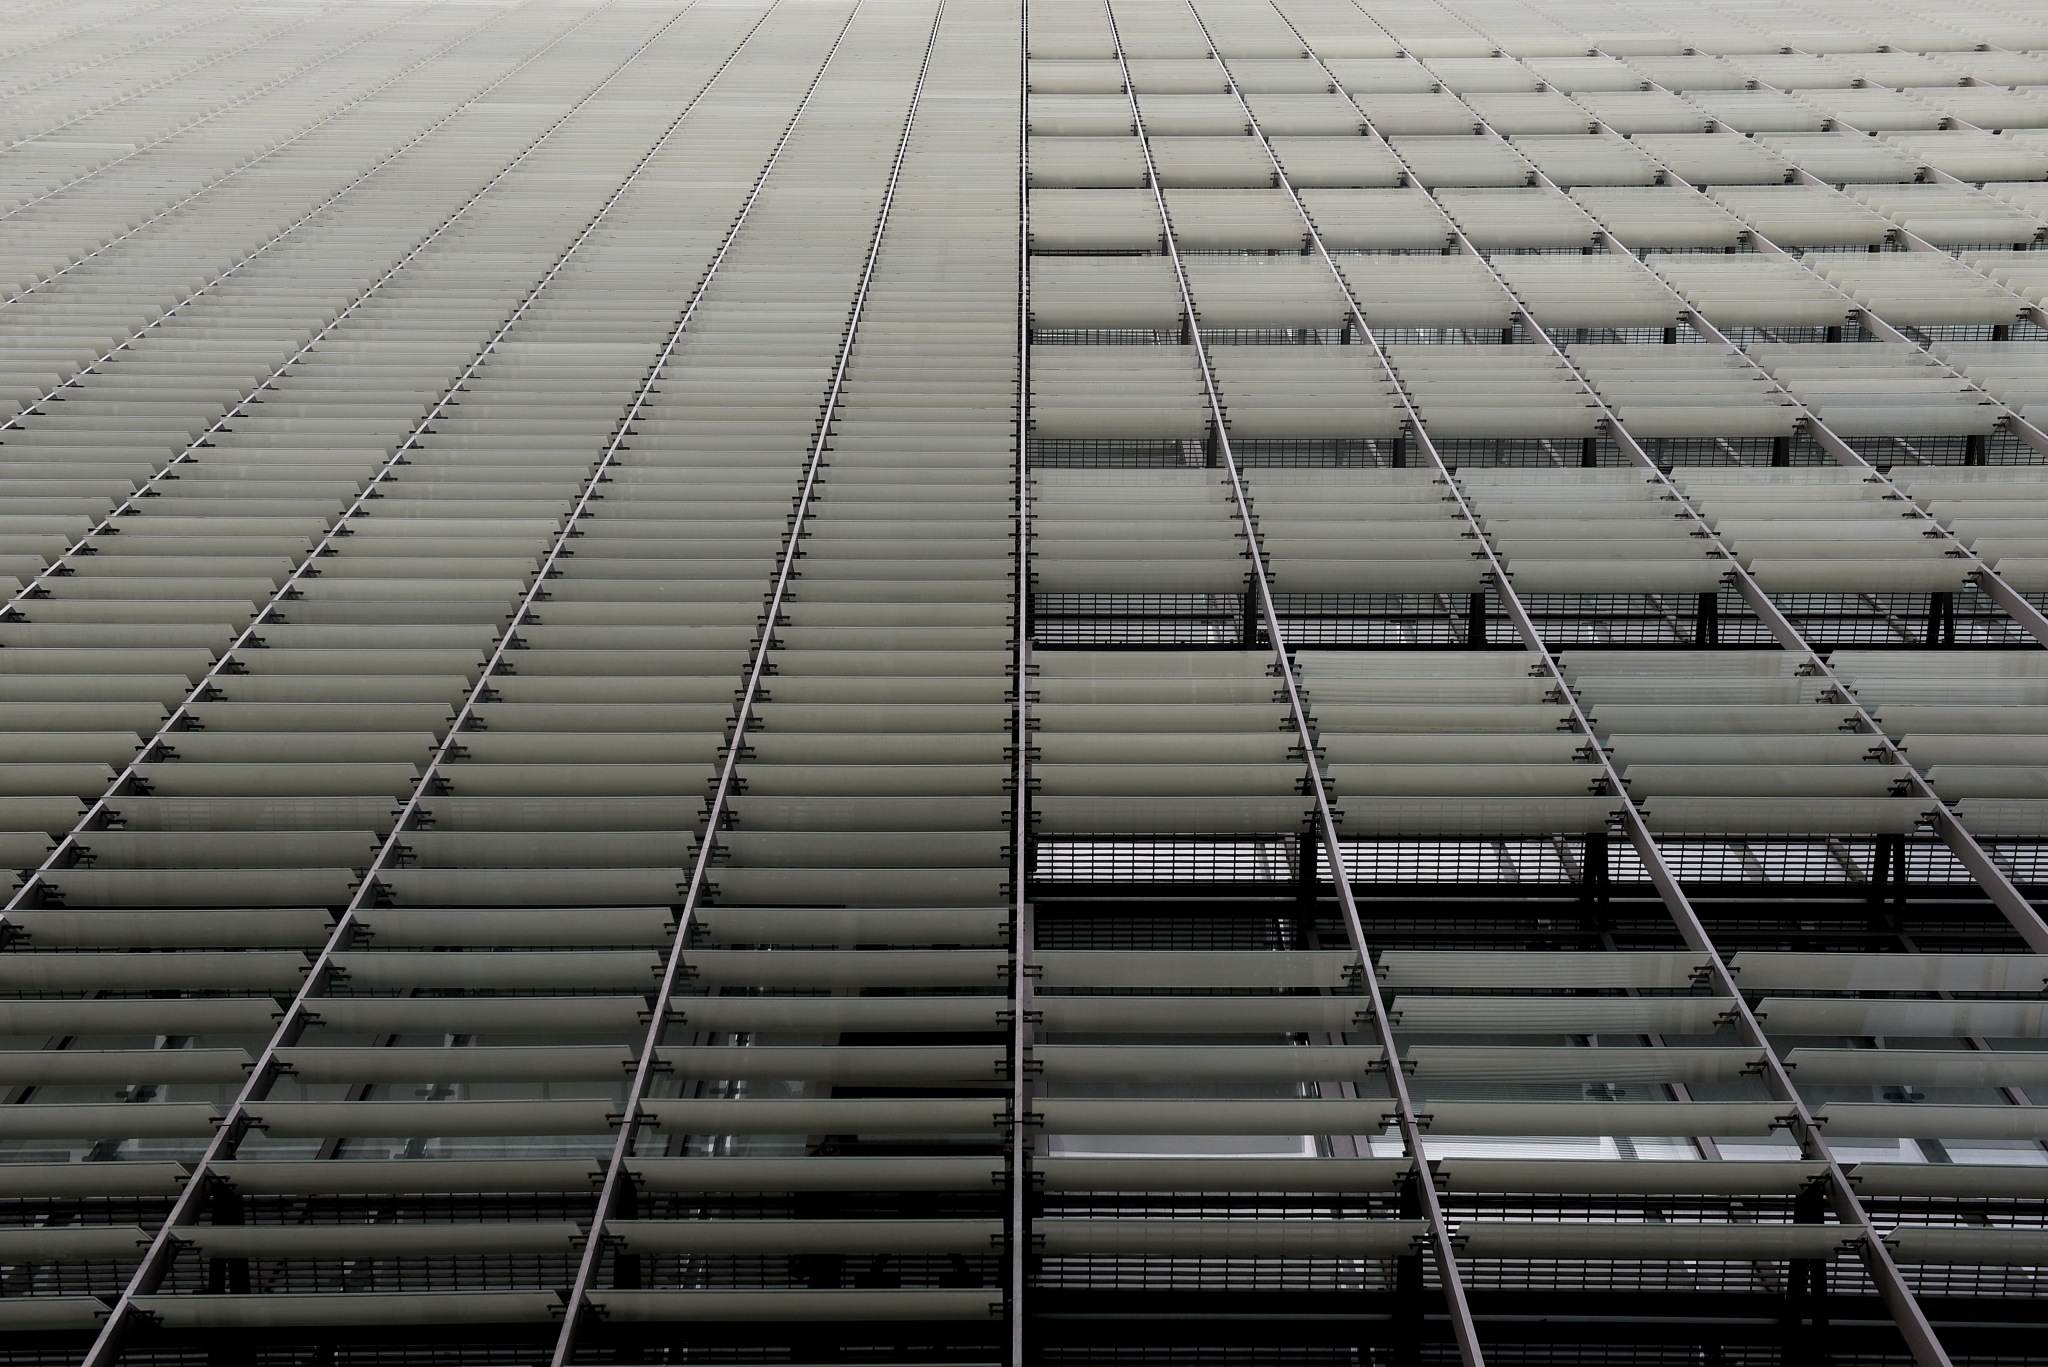 Symmetrical lines #2 by Ido Shahar